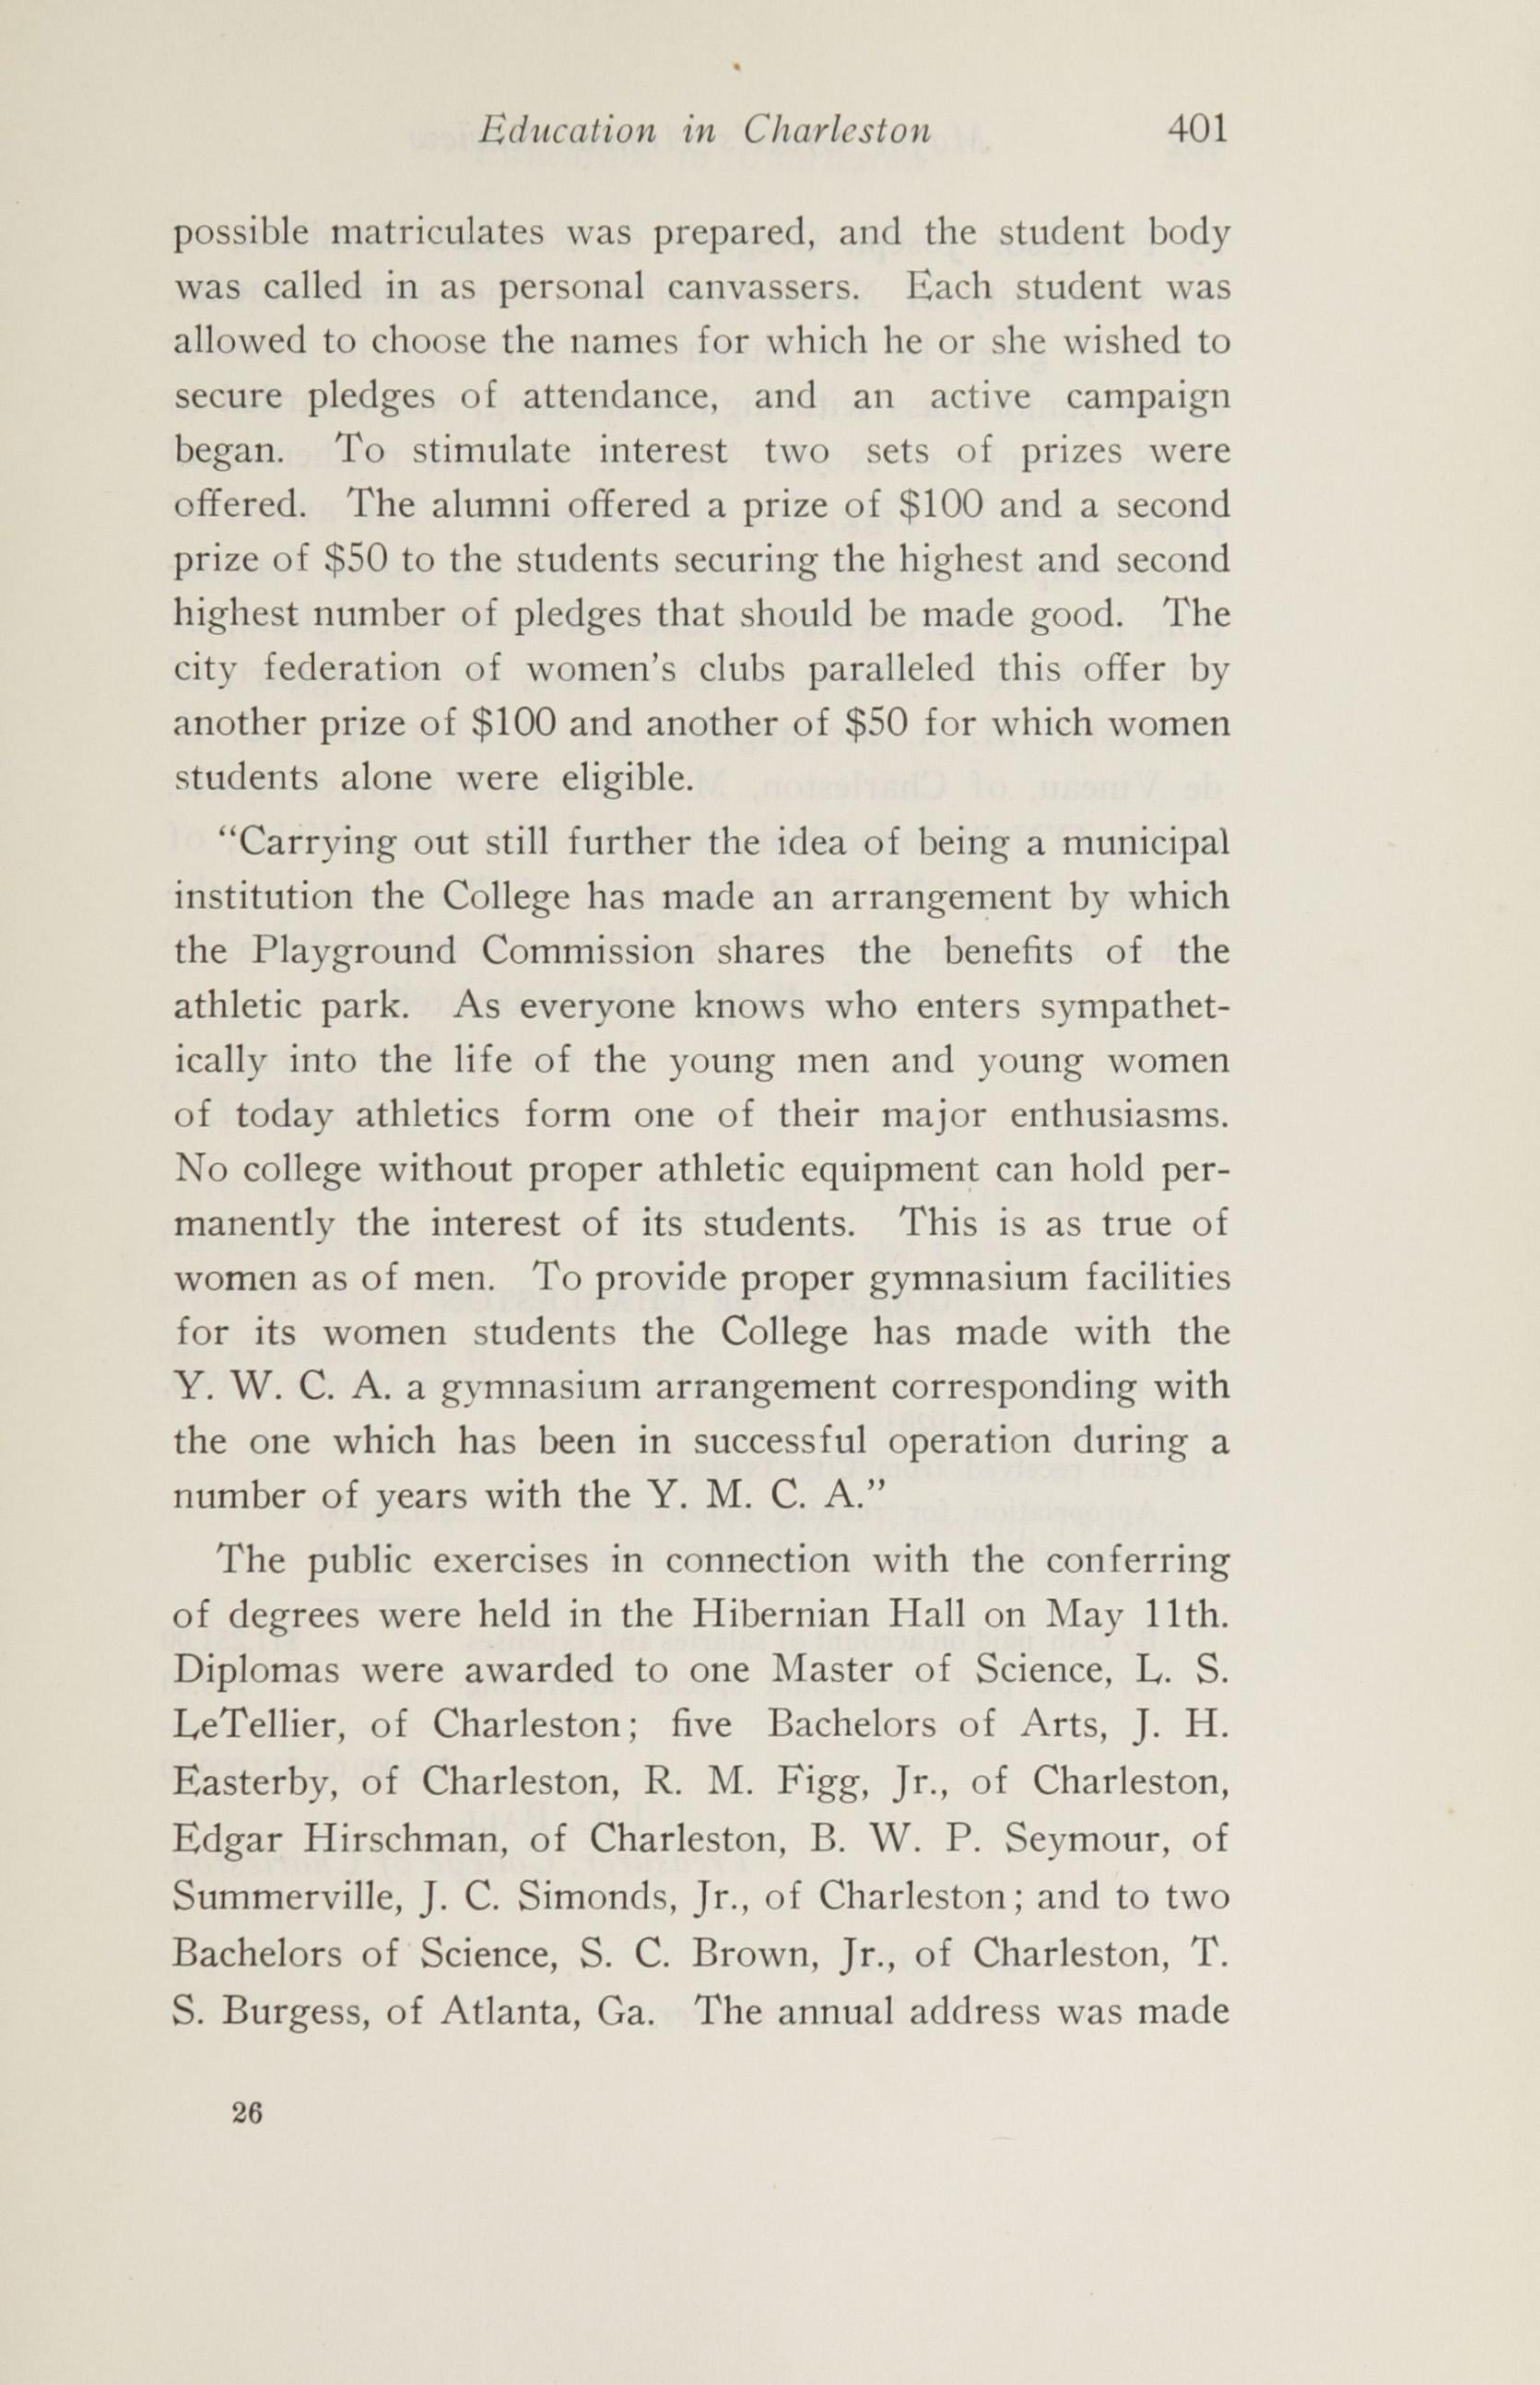 Charleston Yearbook, 1920, page 401